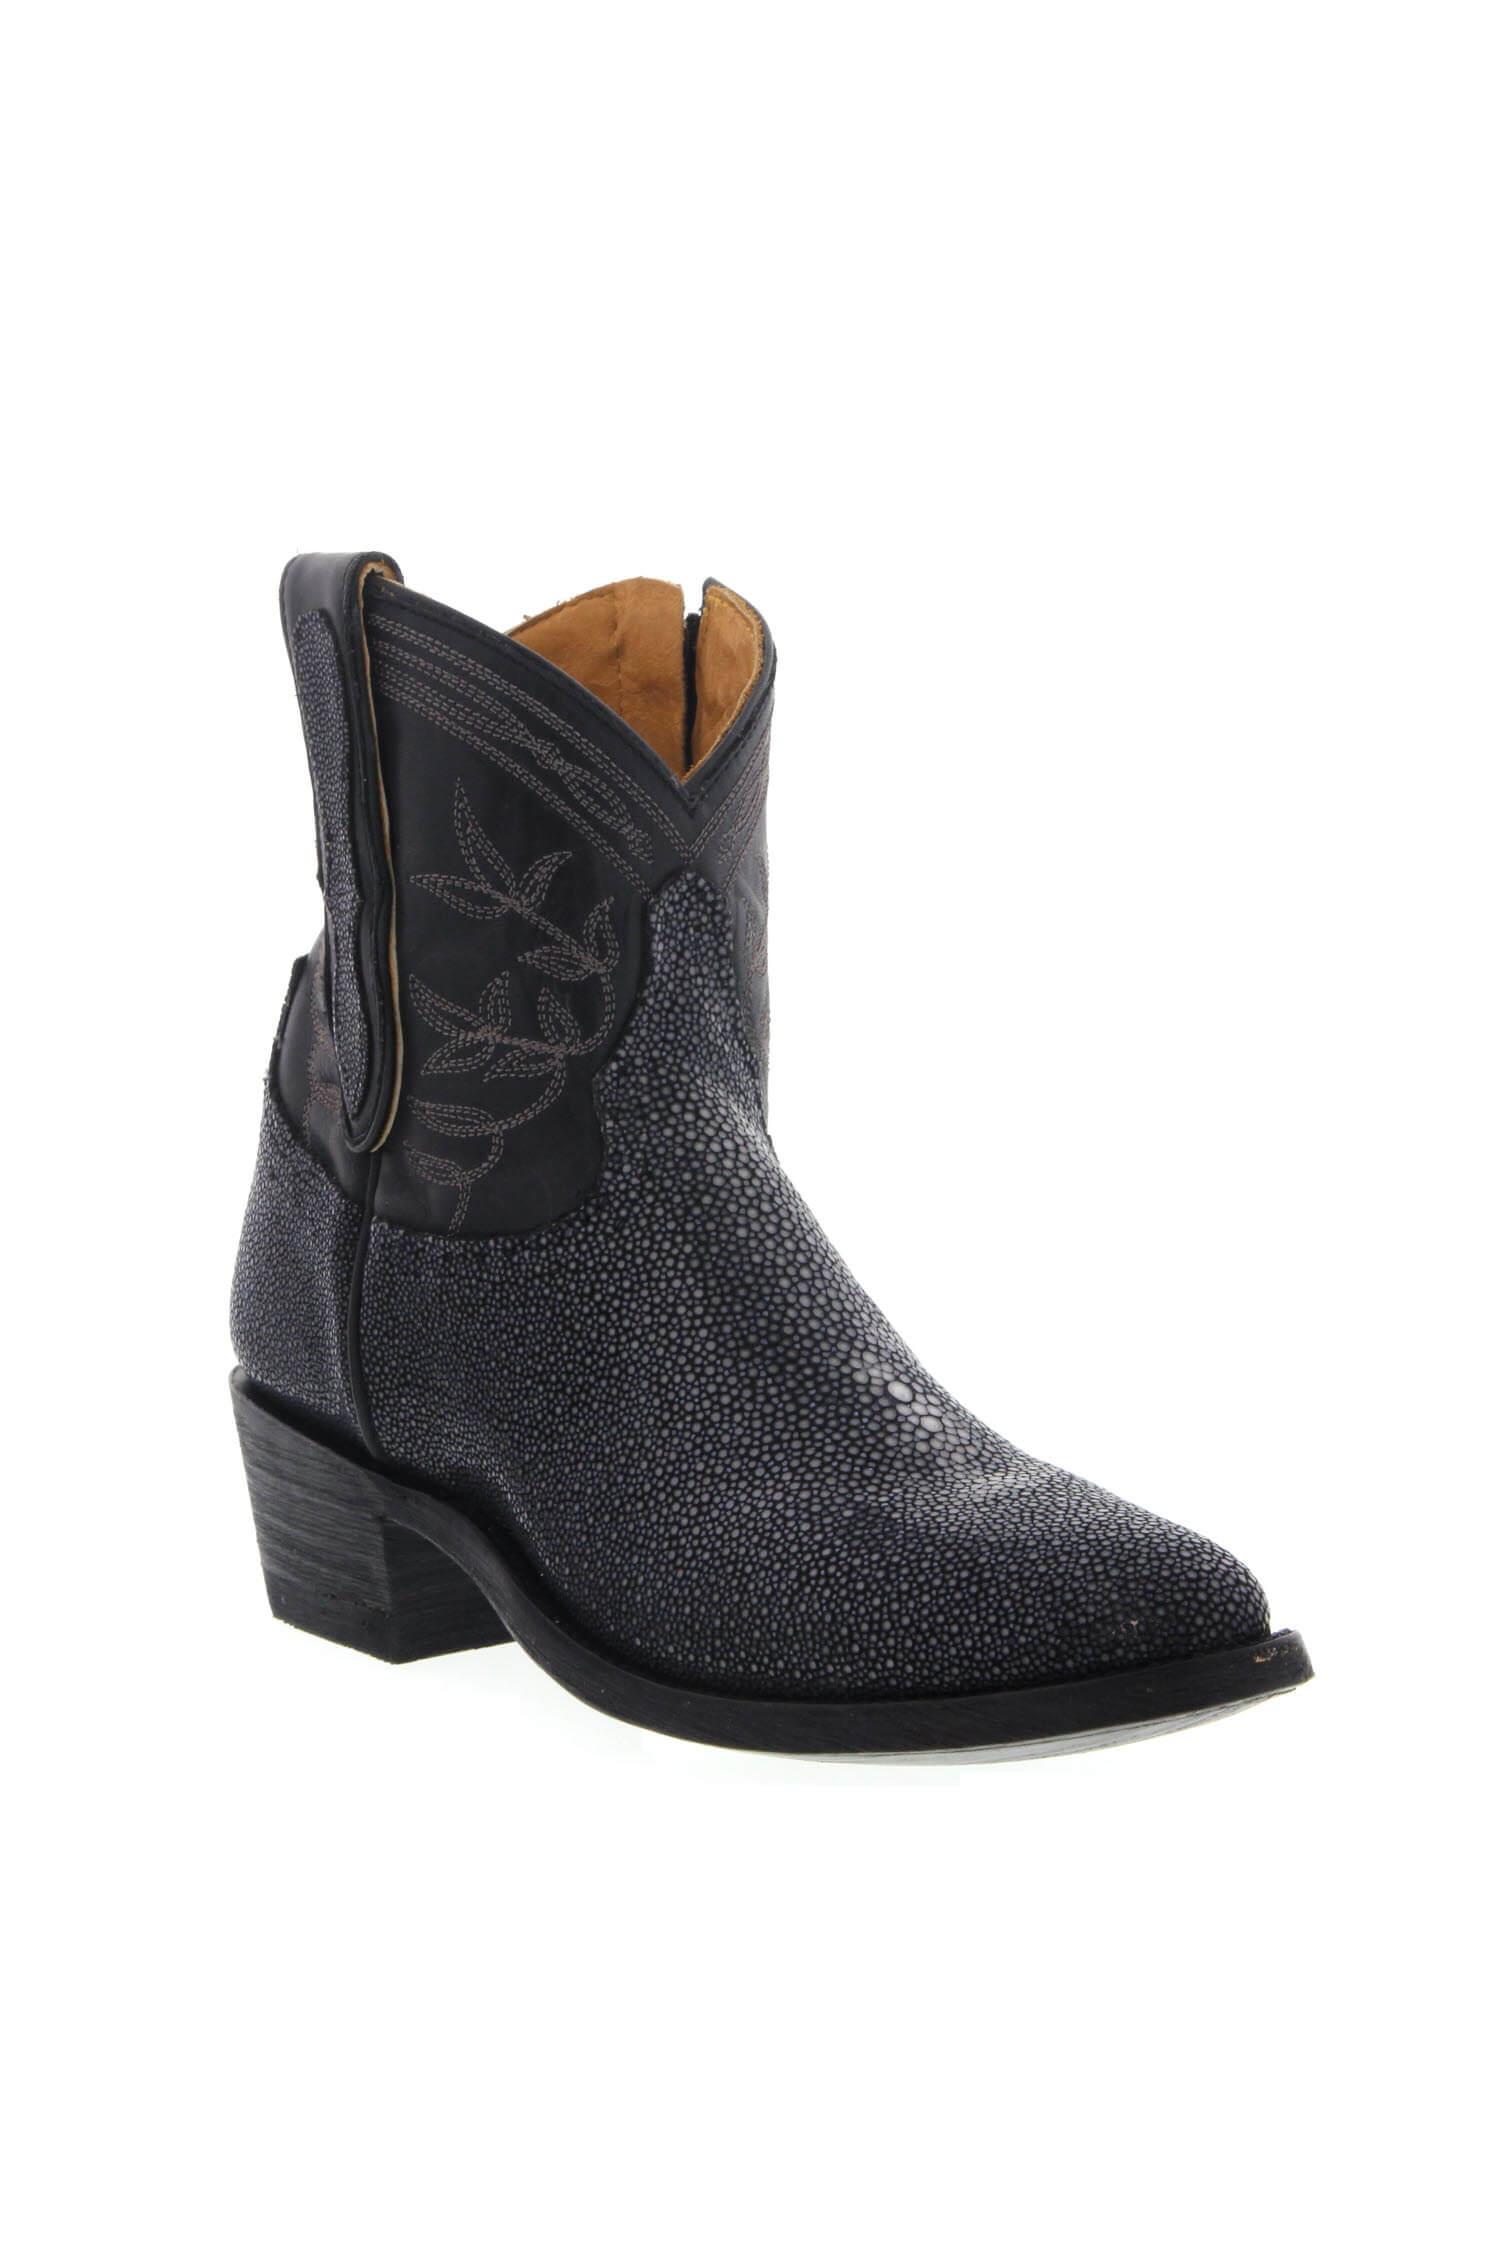 boots polozipper ear mexicana. Black Bedroom Furniture Sets. Home Design Ideas